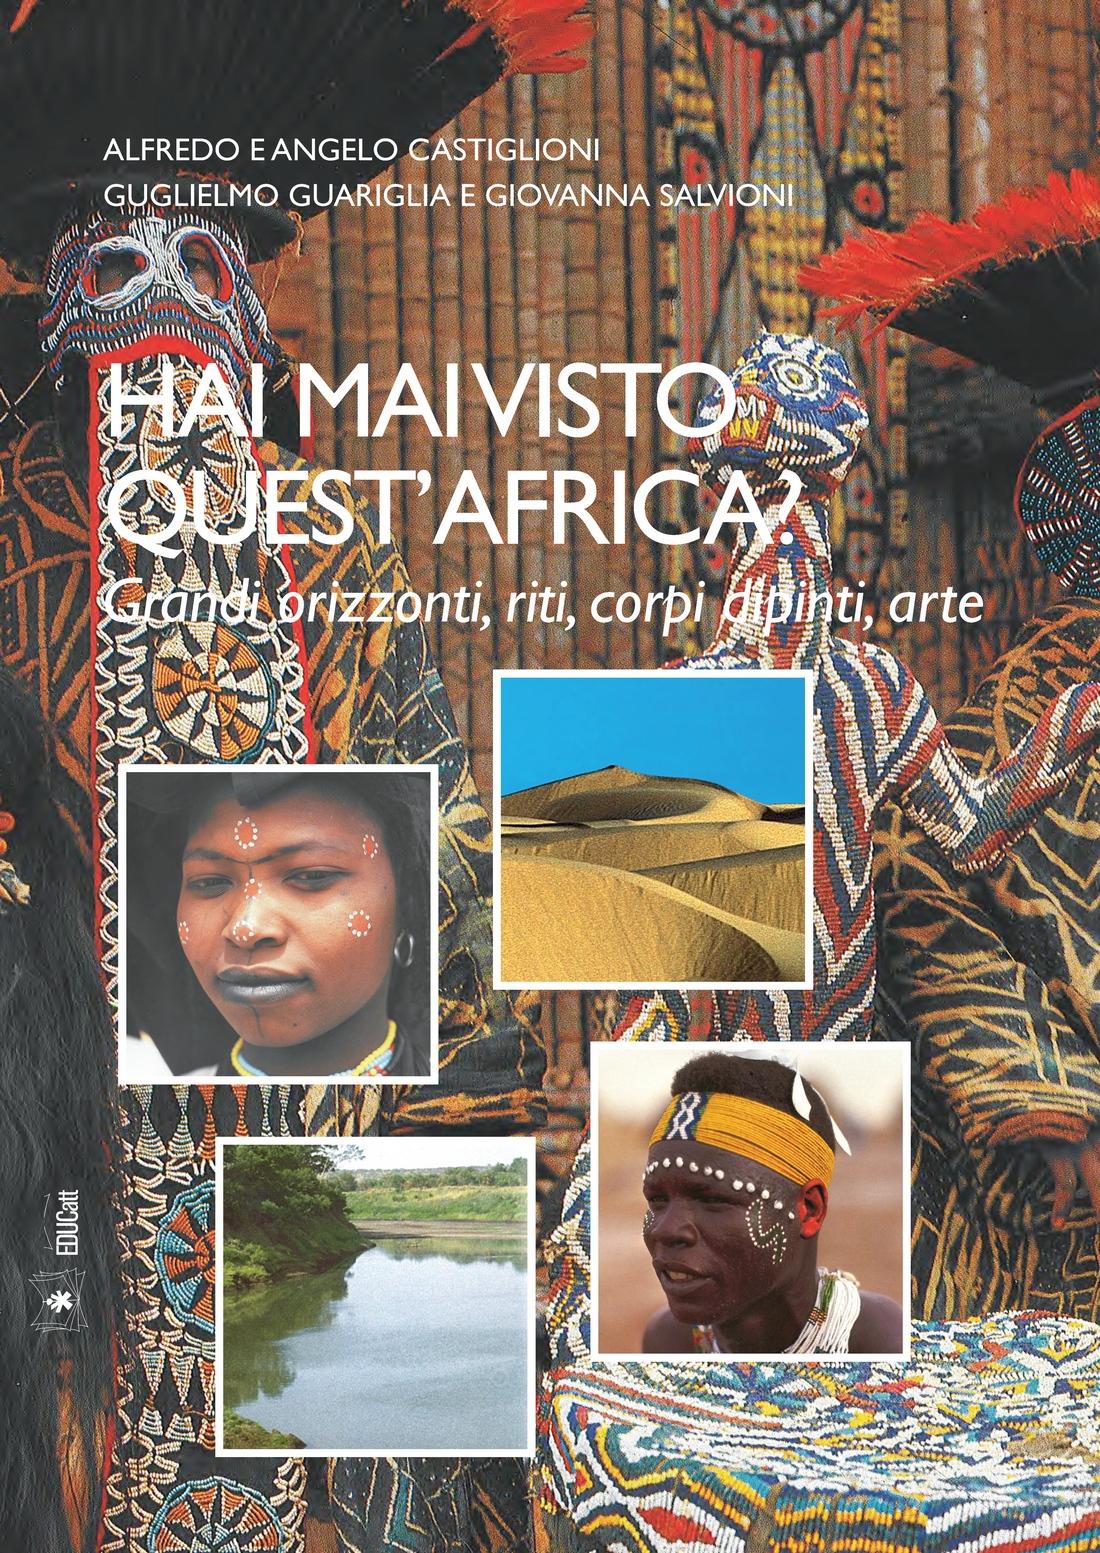 HAI MAI VISTO QUEST'AFRICA? GRANDI ORIZZONTI, RITI, CORPI, DIPINTI, ARTE